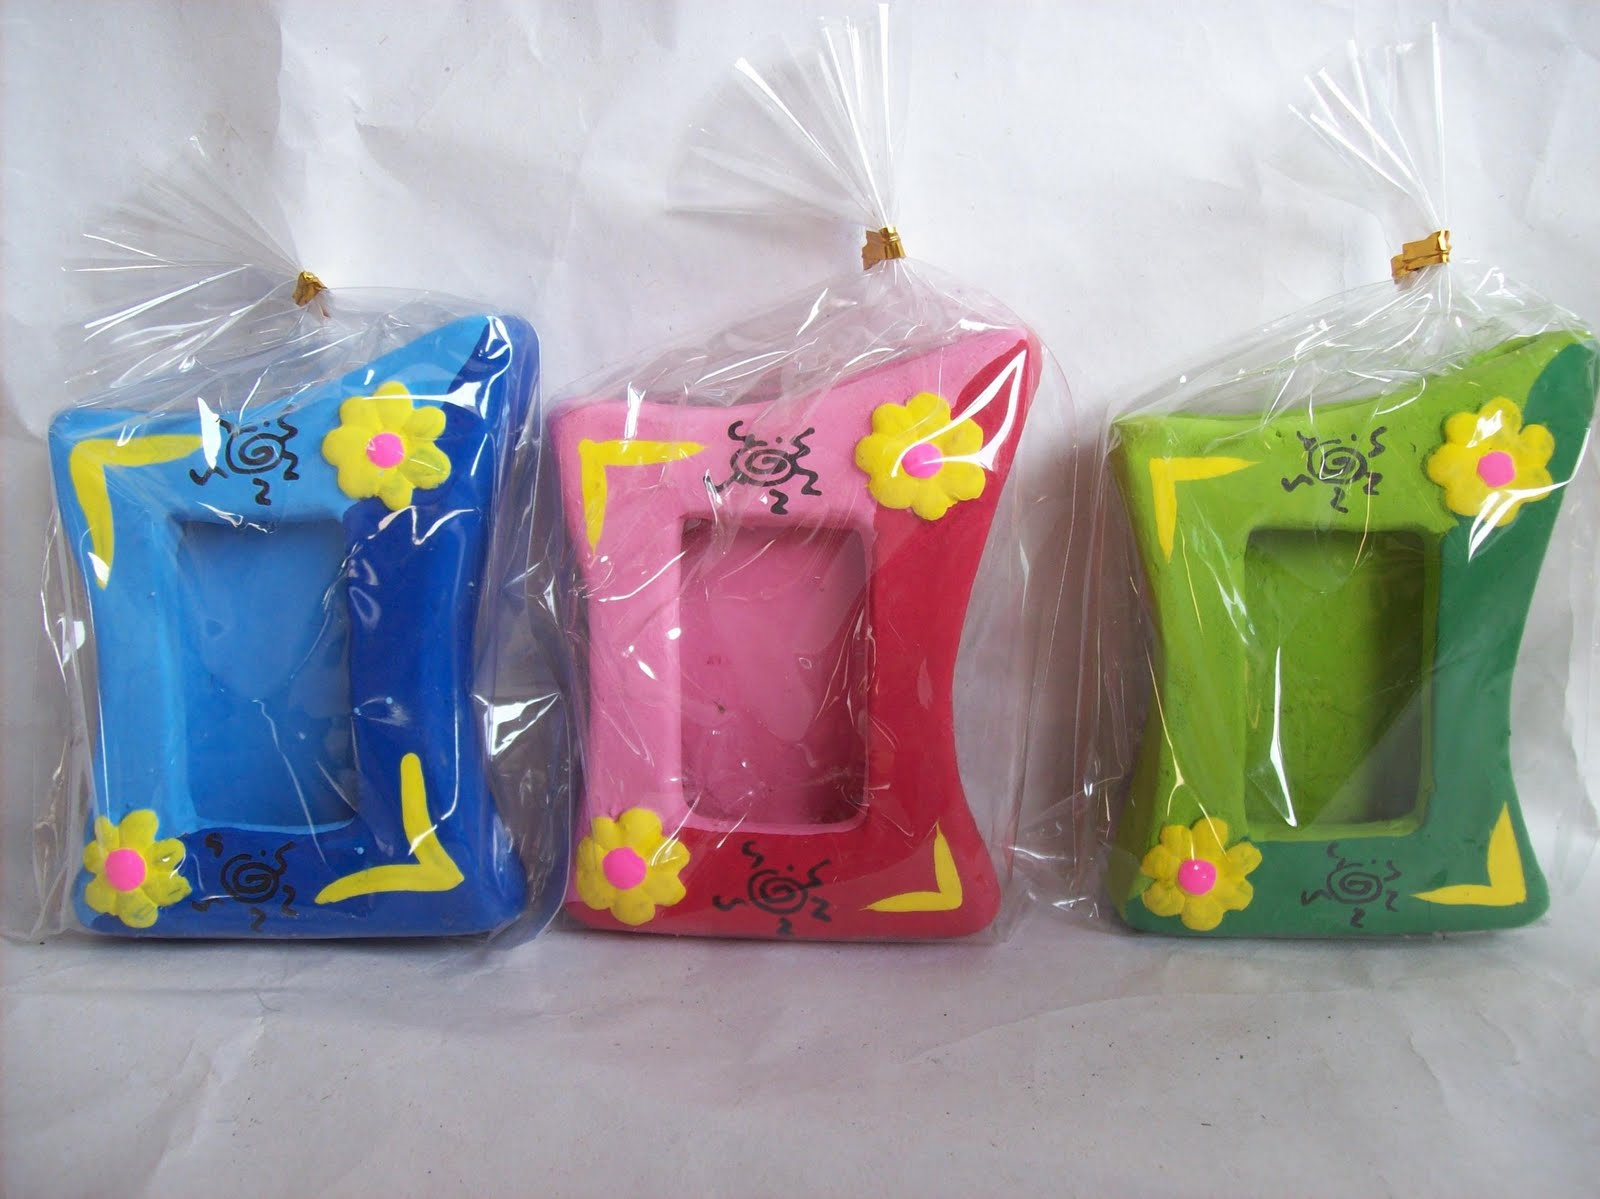 souvenir pernikahan murah | undangan pernikahan murah | Packing souvenir untuk pernikahan harga murah